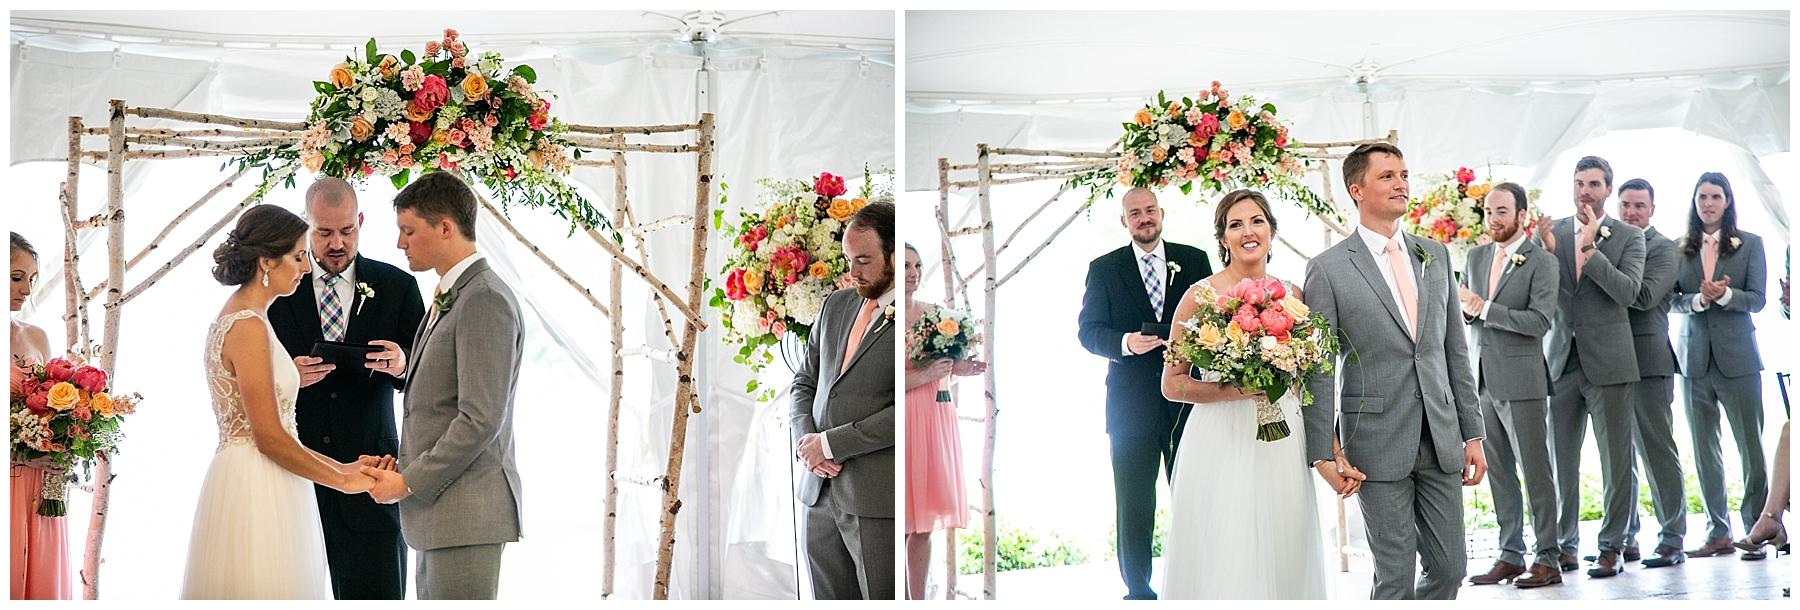 Chelsea Phil Bohemia River Overlook Wedding Living Radiant Photography photos_0113.jpg